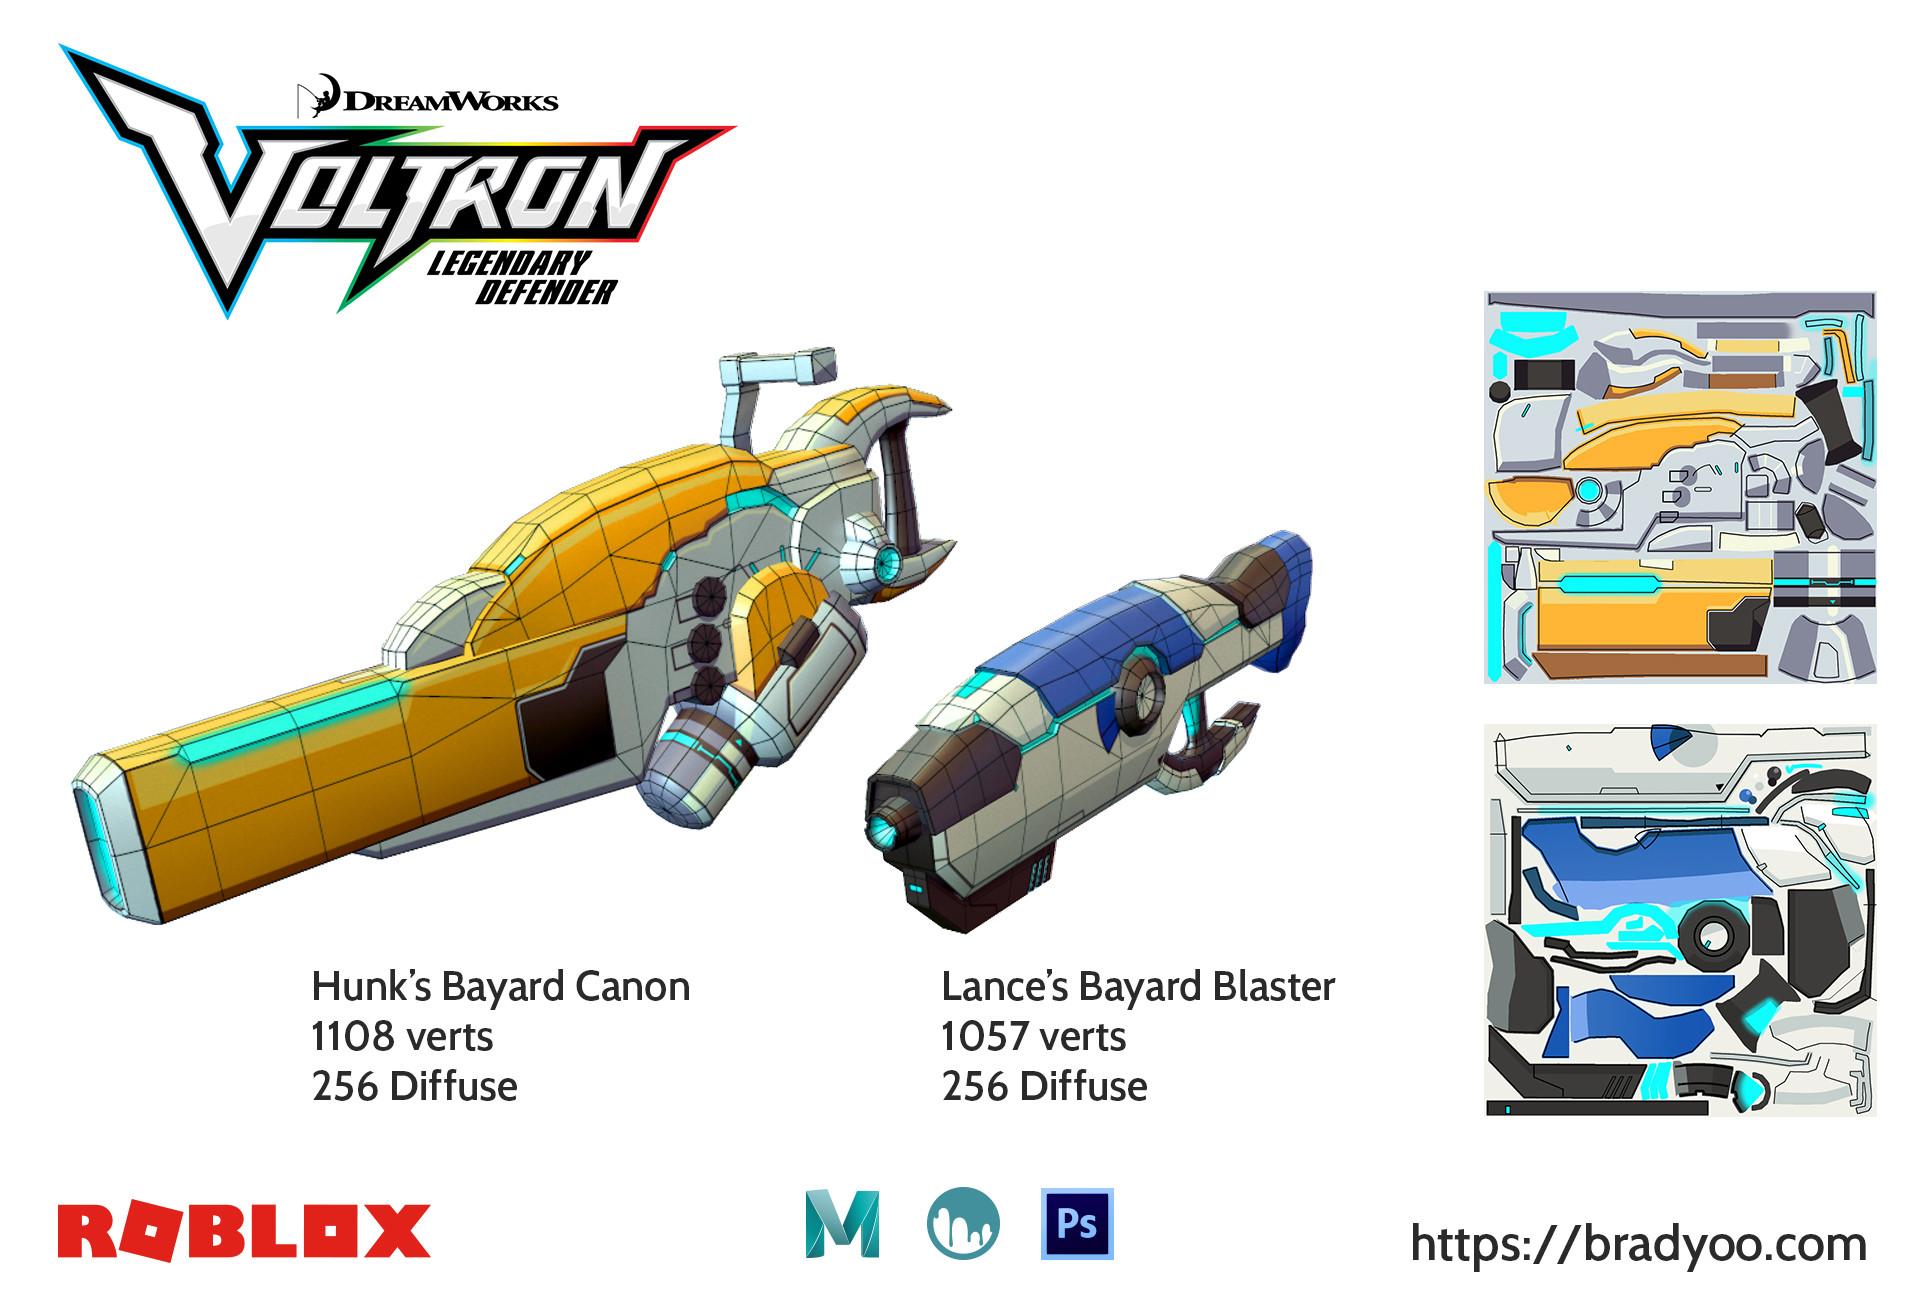 Brx yoo voltron blasters02 roblox 2017